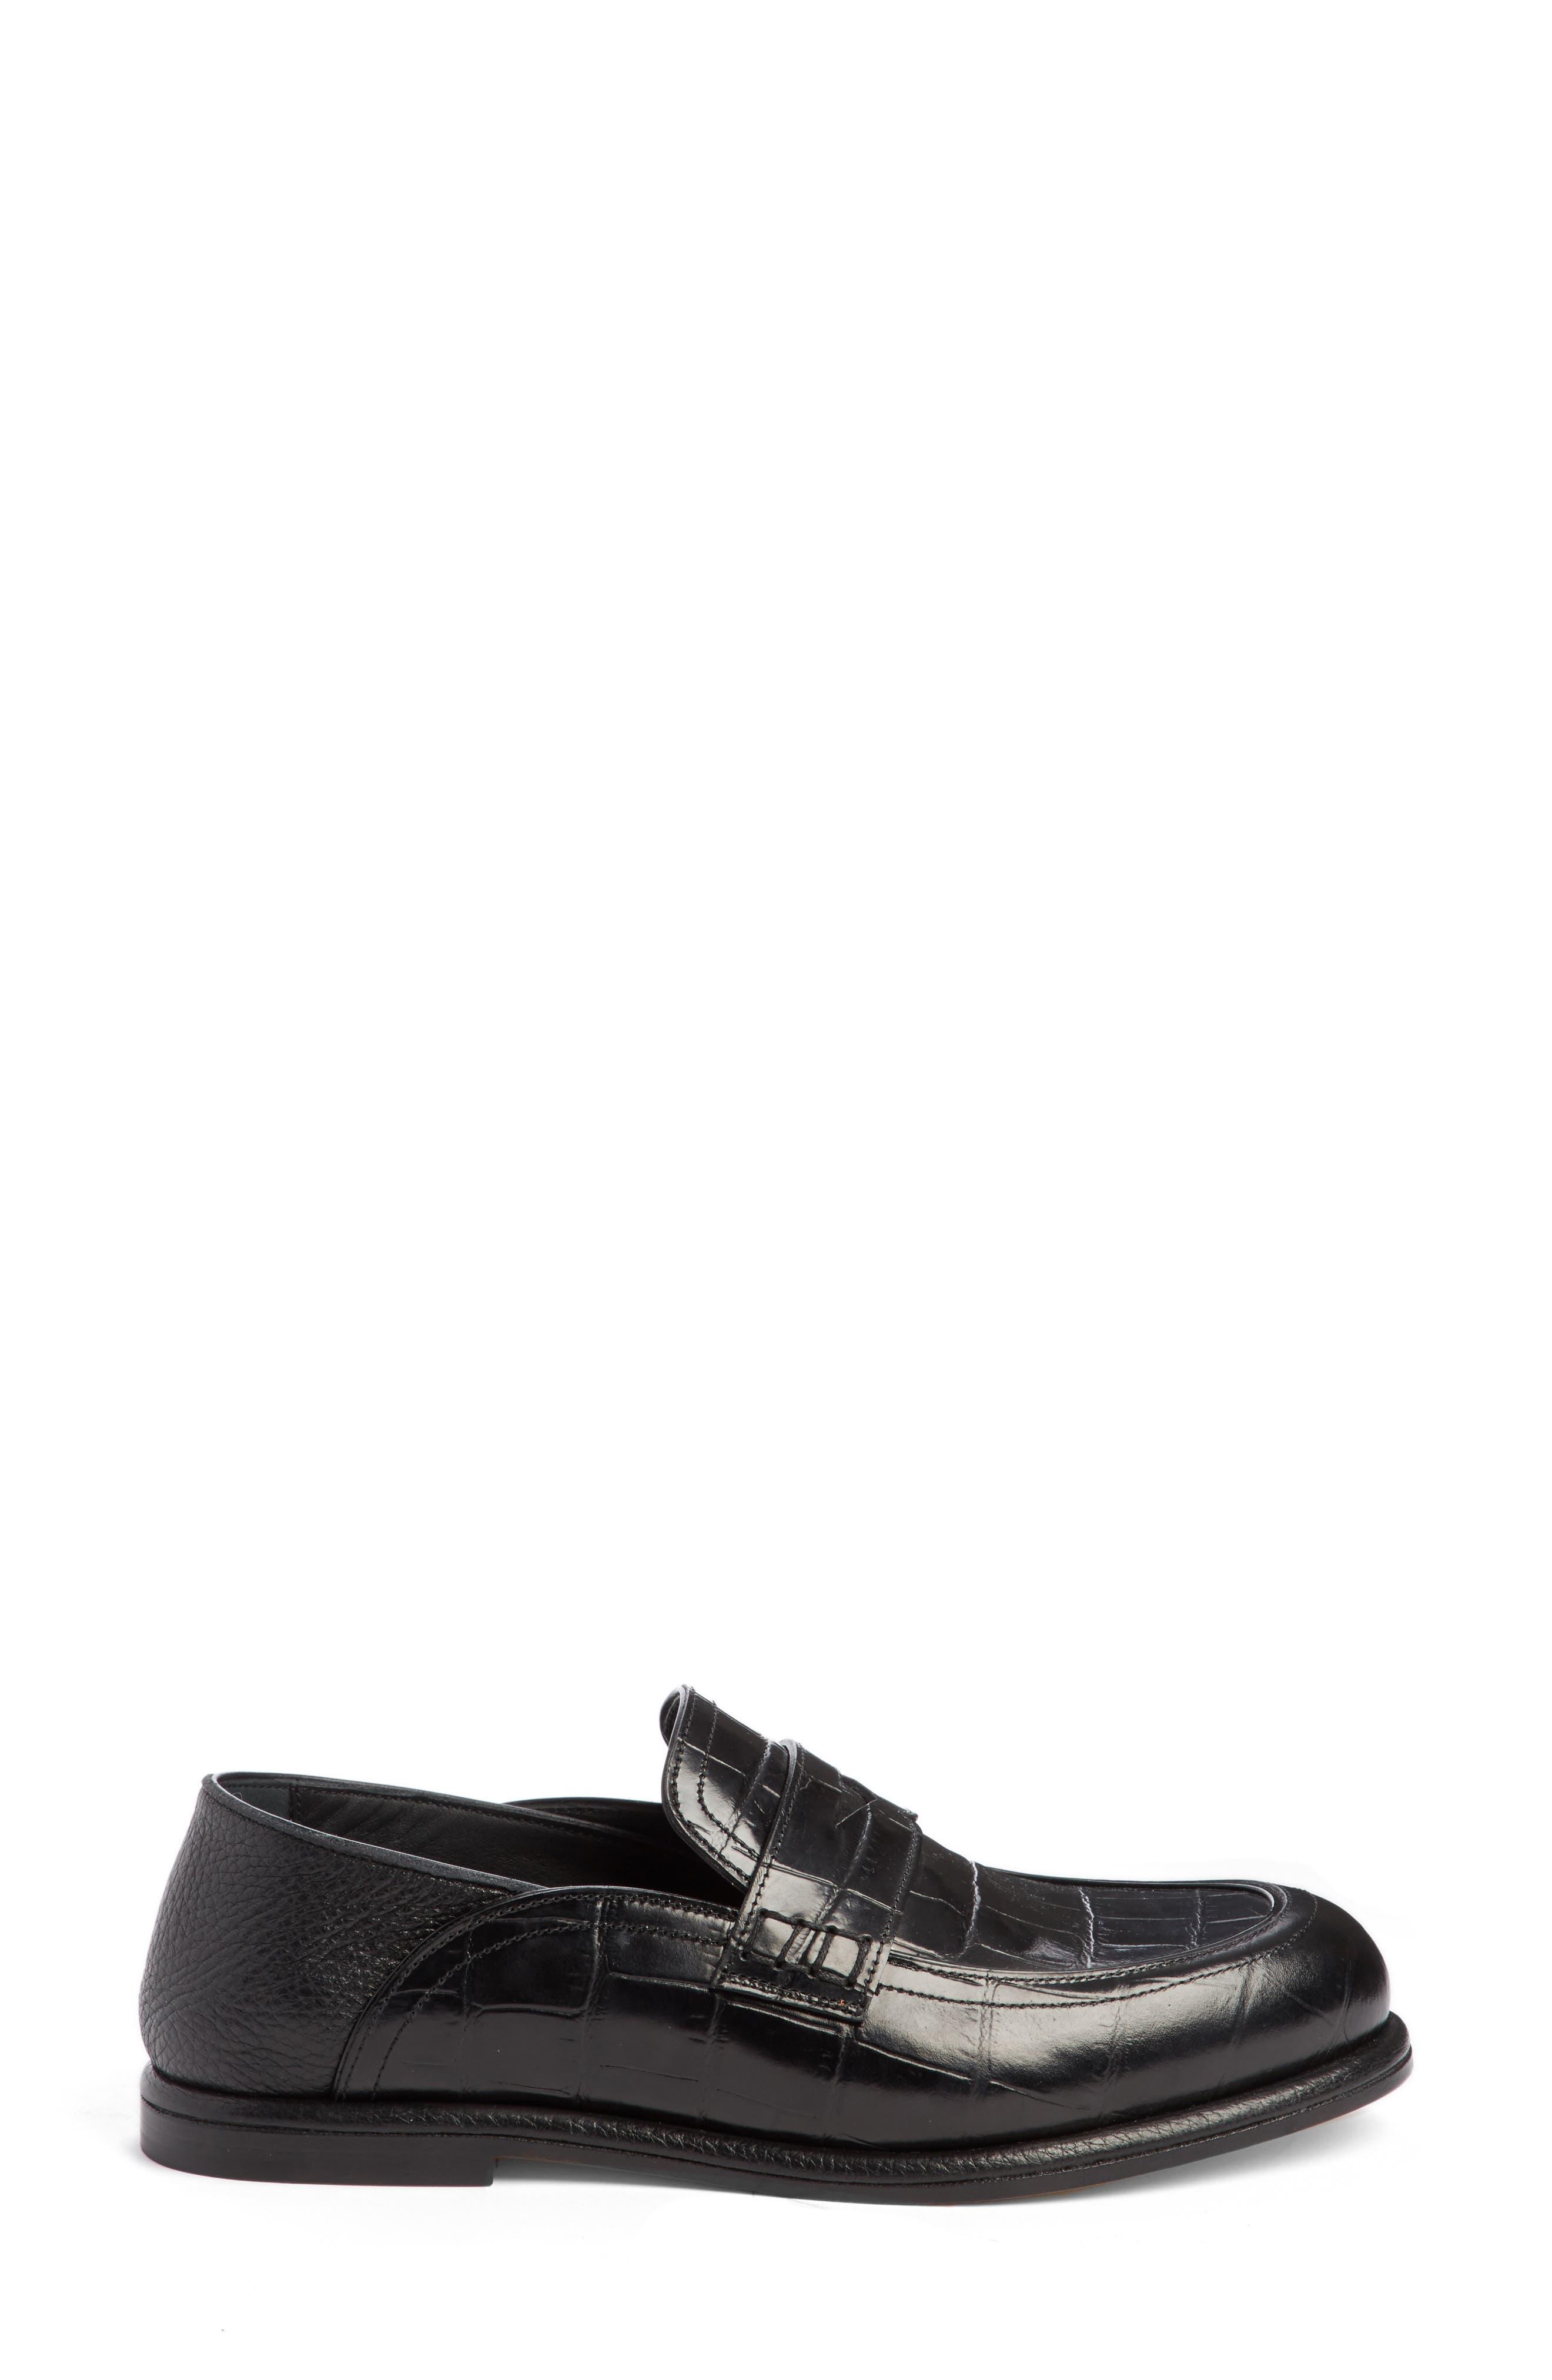 Croc Embossed Convertible Loafer,                             Alternate thumbnail 2, color,                             Black